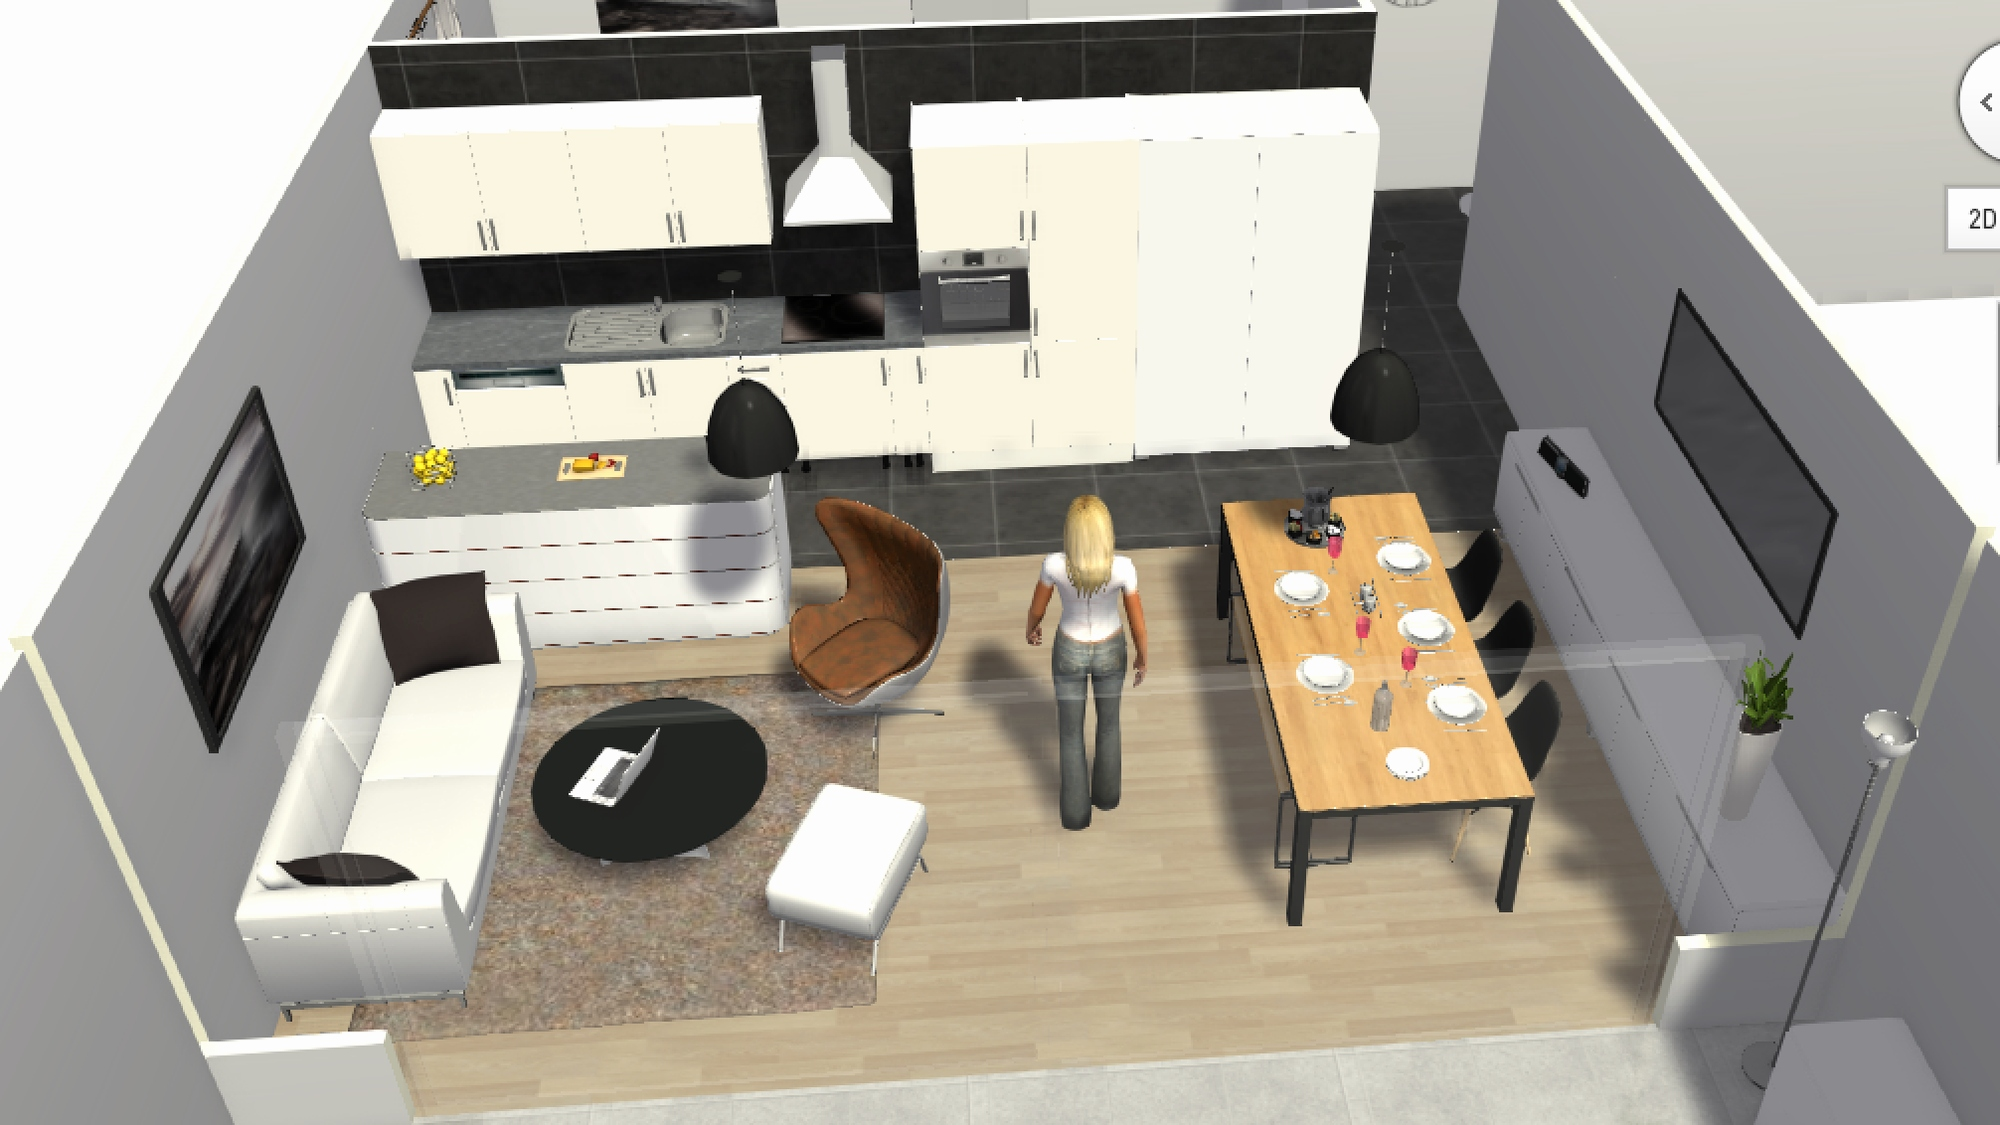 Plan salon cuisine 30m2 - Salon cuisine 30m2 ...